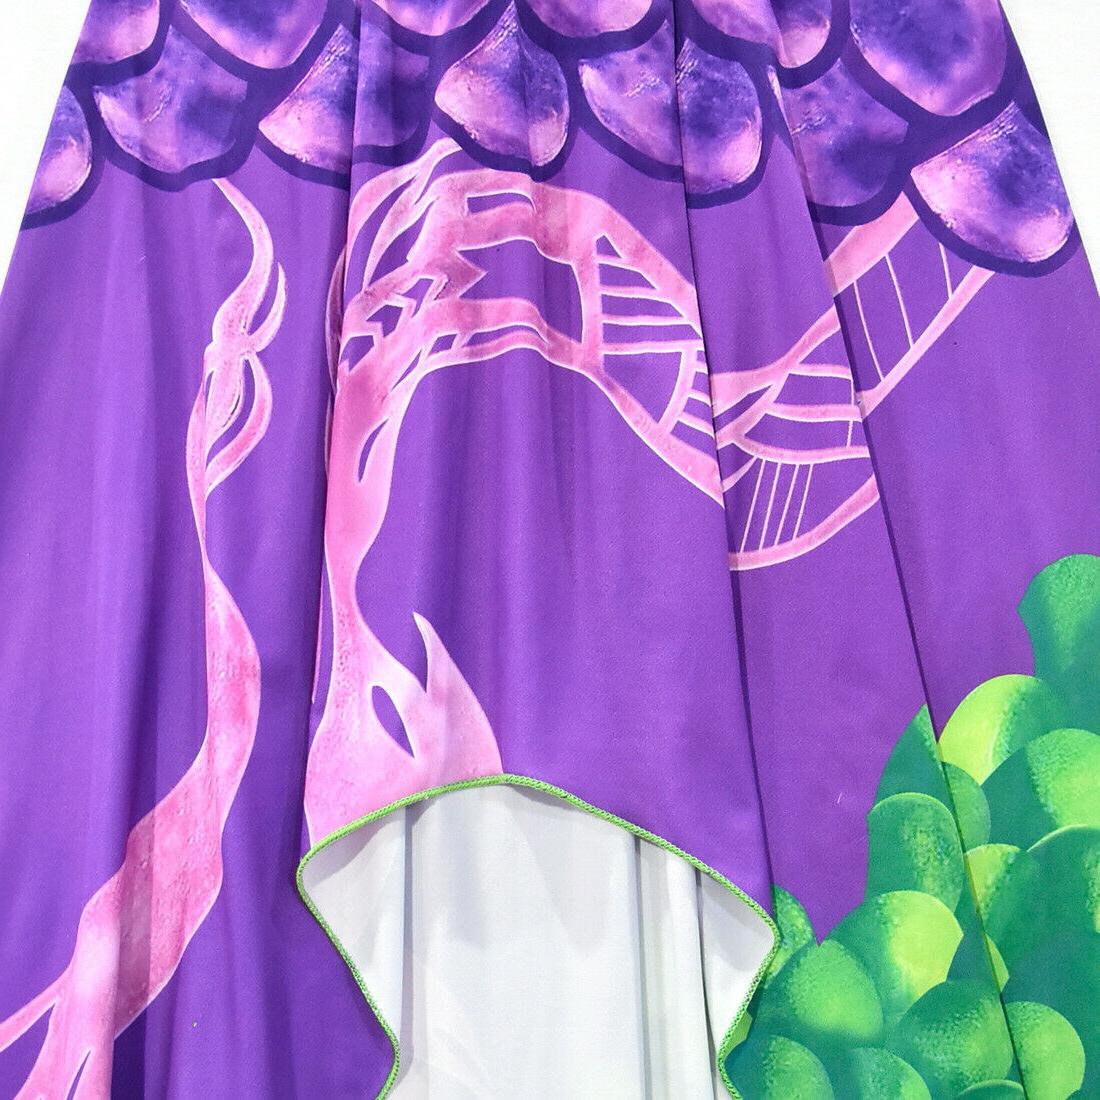 Mal Jumpsuit Costume Cosplay Girls